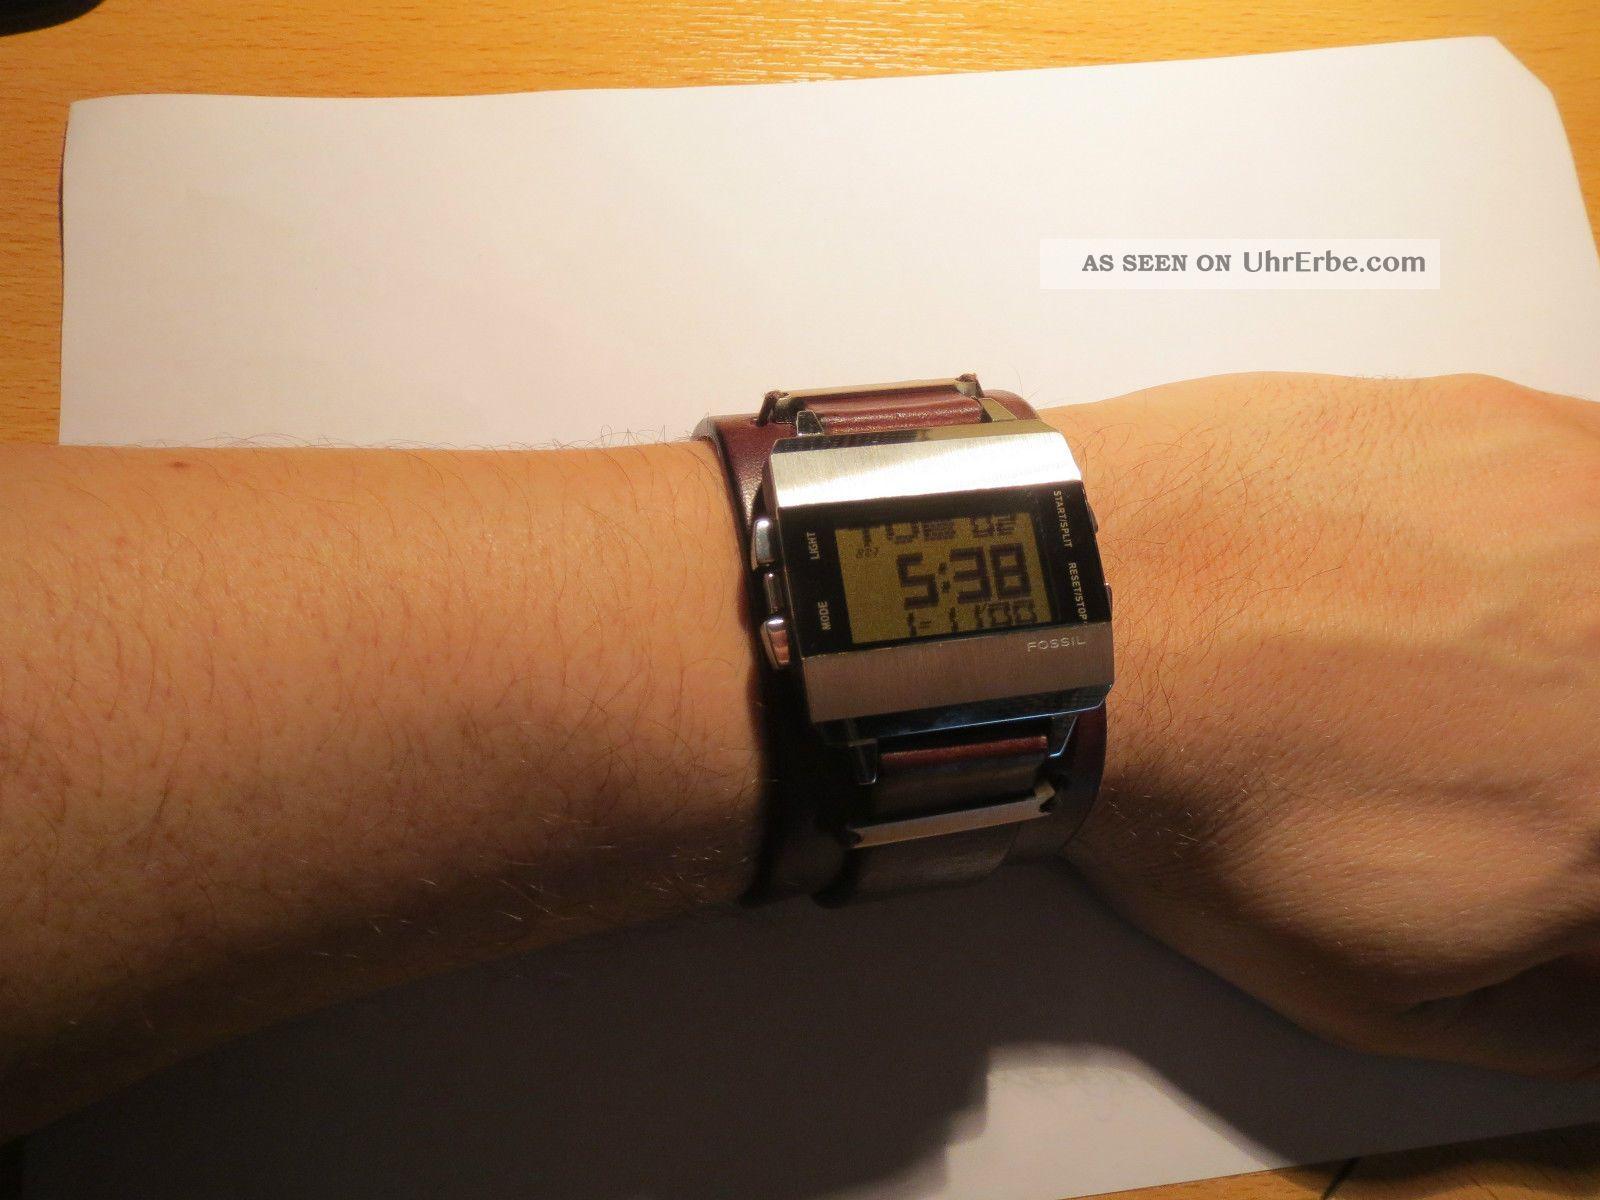 Fossil Herren Armbanduhr Leder Braun Top - Armbanduhren Bild